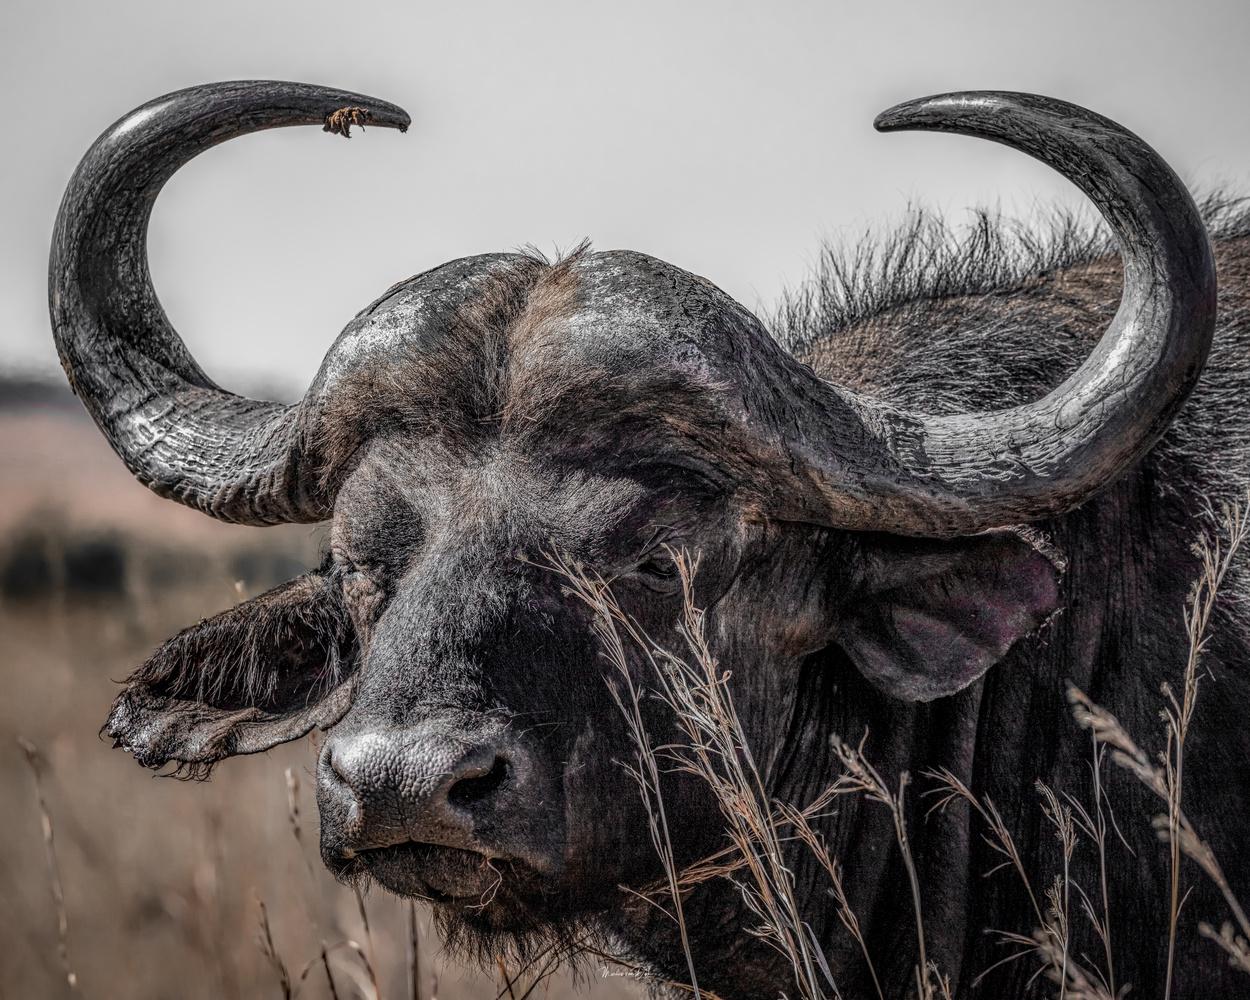 Cape Buffalo by Marius van Dyk